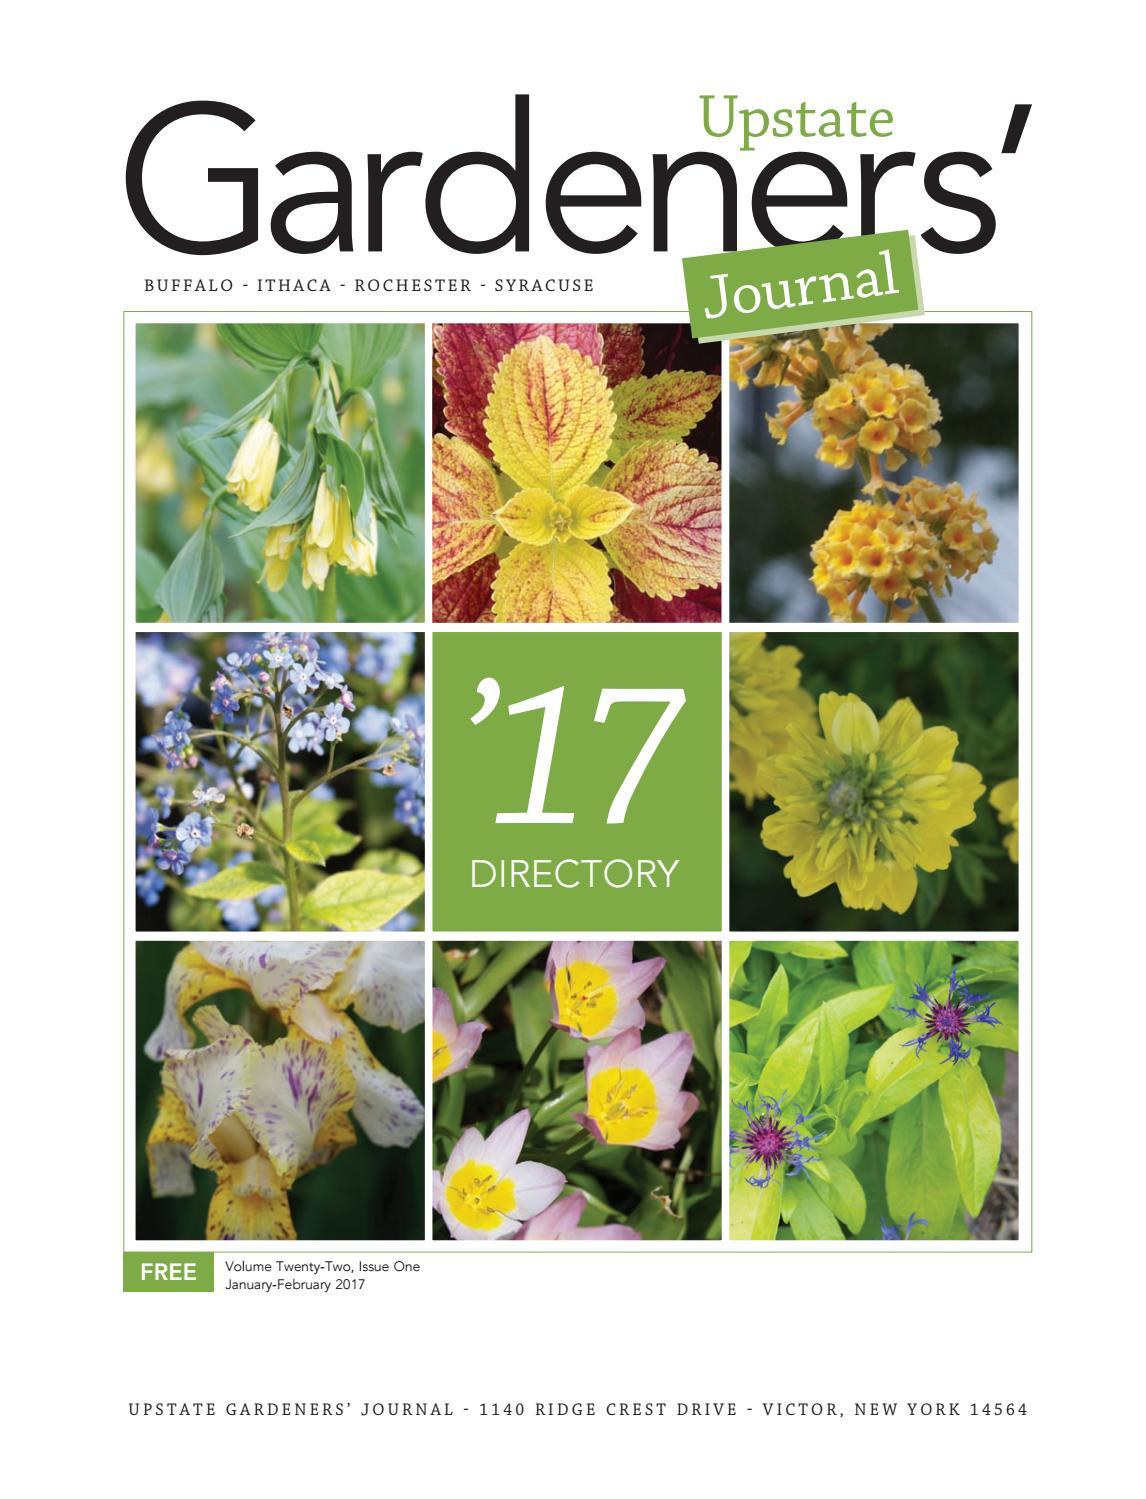 2017ugjdirectory by upstate gardeners' journal - issuu